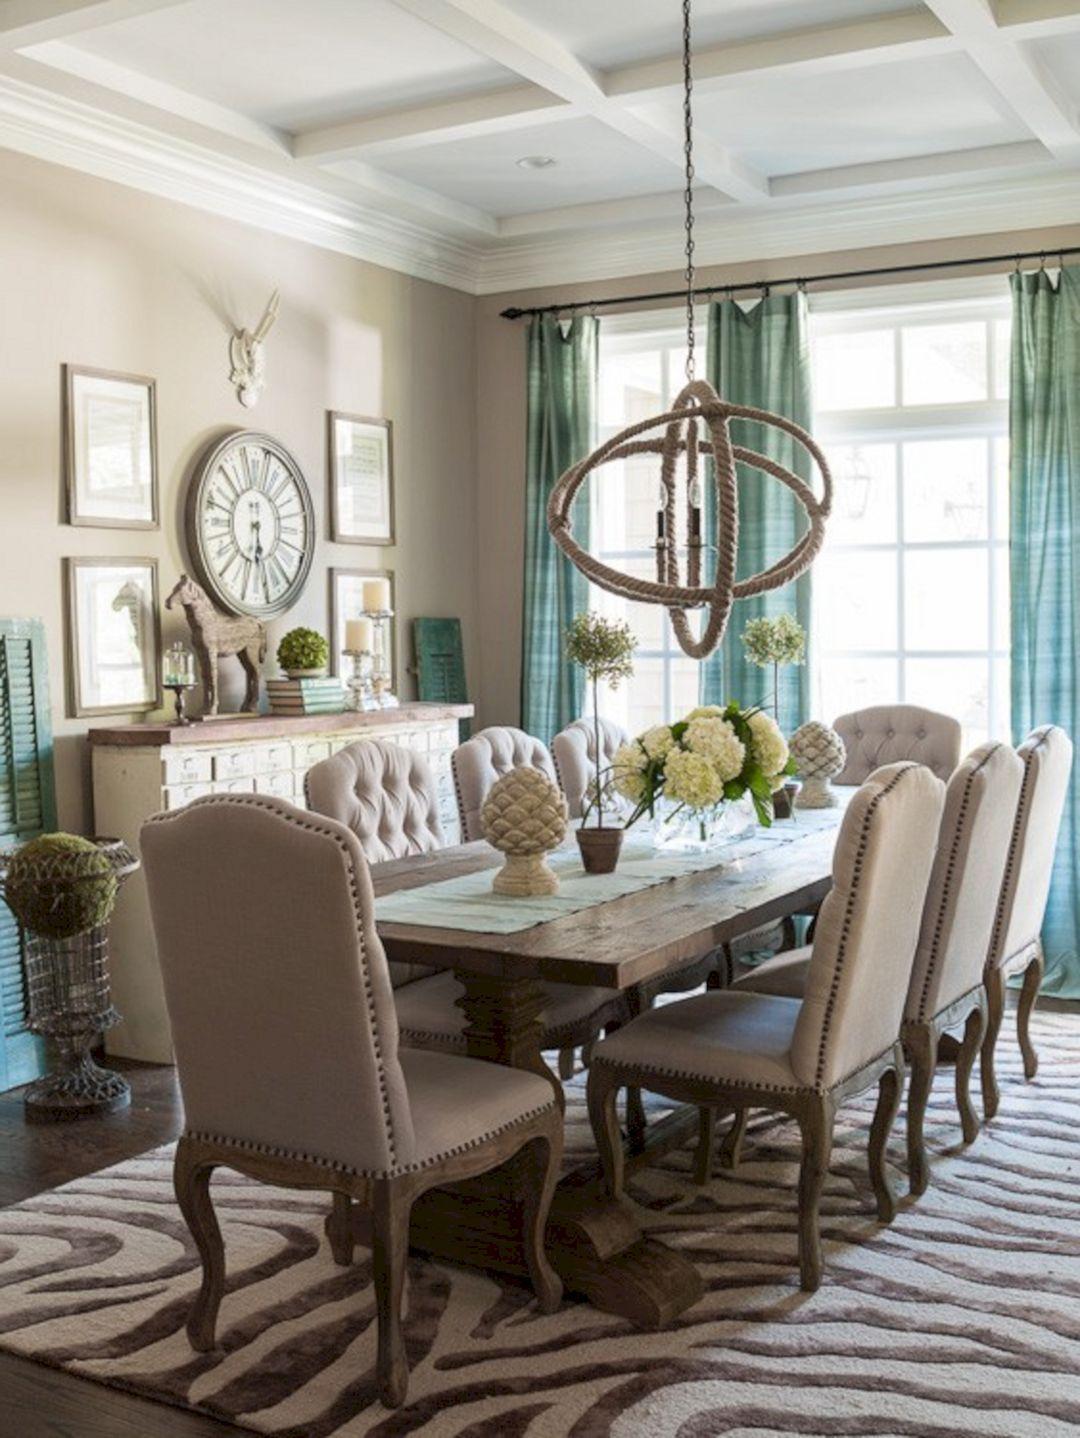 75 Simple and Minimalist Dining Table Decor Ideas 25050 ...